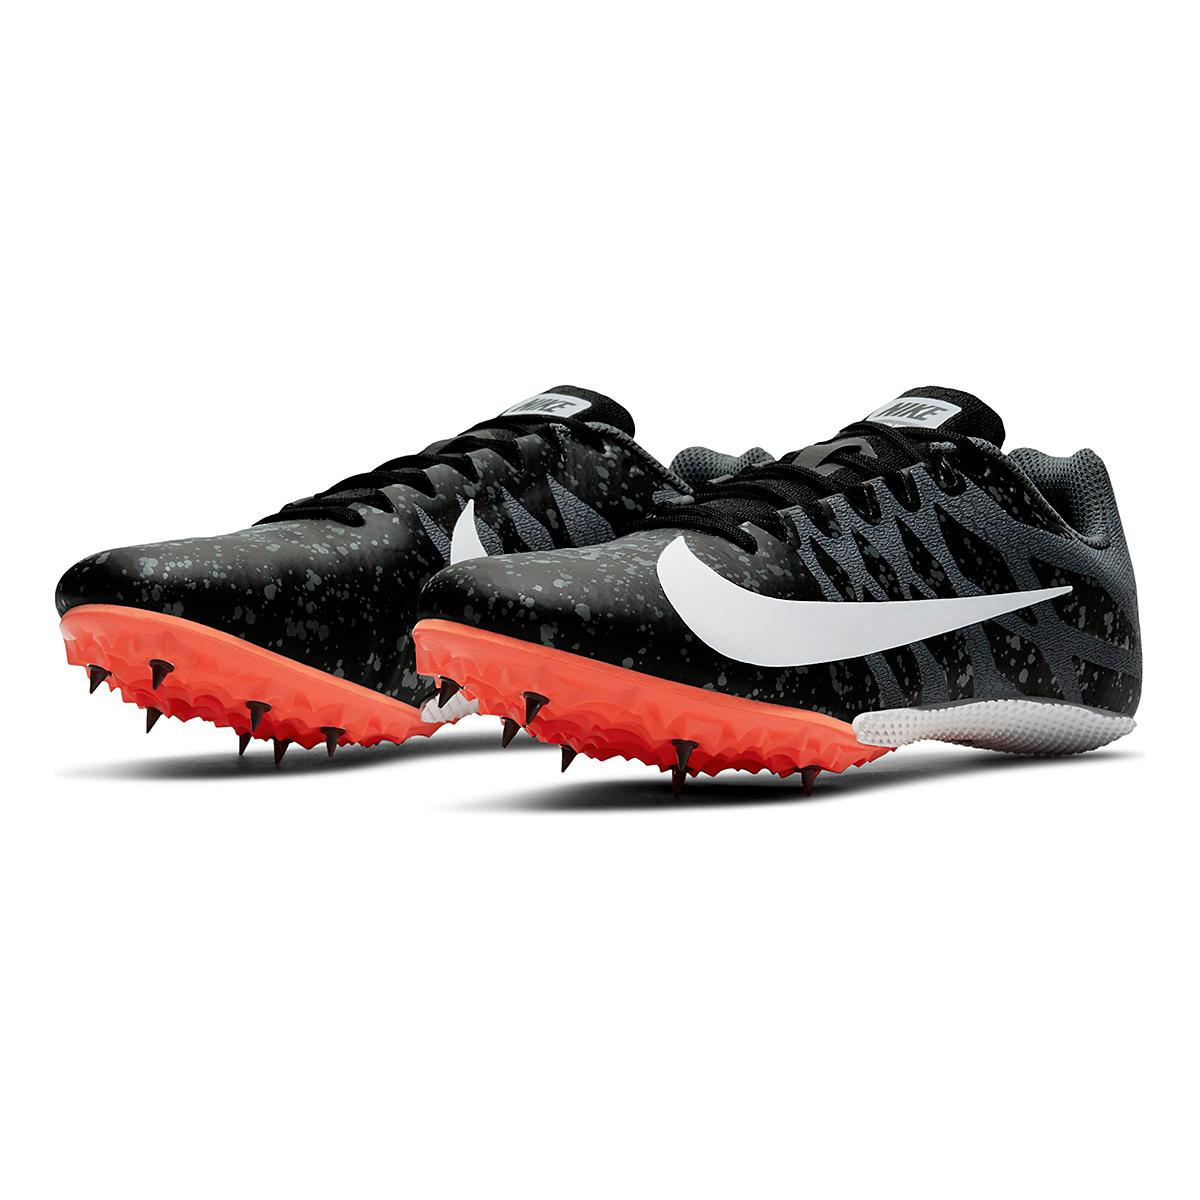 Men's Nike Zoom Rival S 9 Track Spikes - Color: Black/White/Orange - Size: 4 - Width: Regular, Black/White/Orange, large, image 4